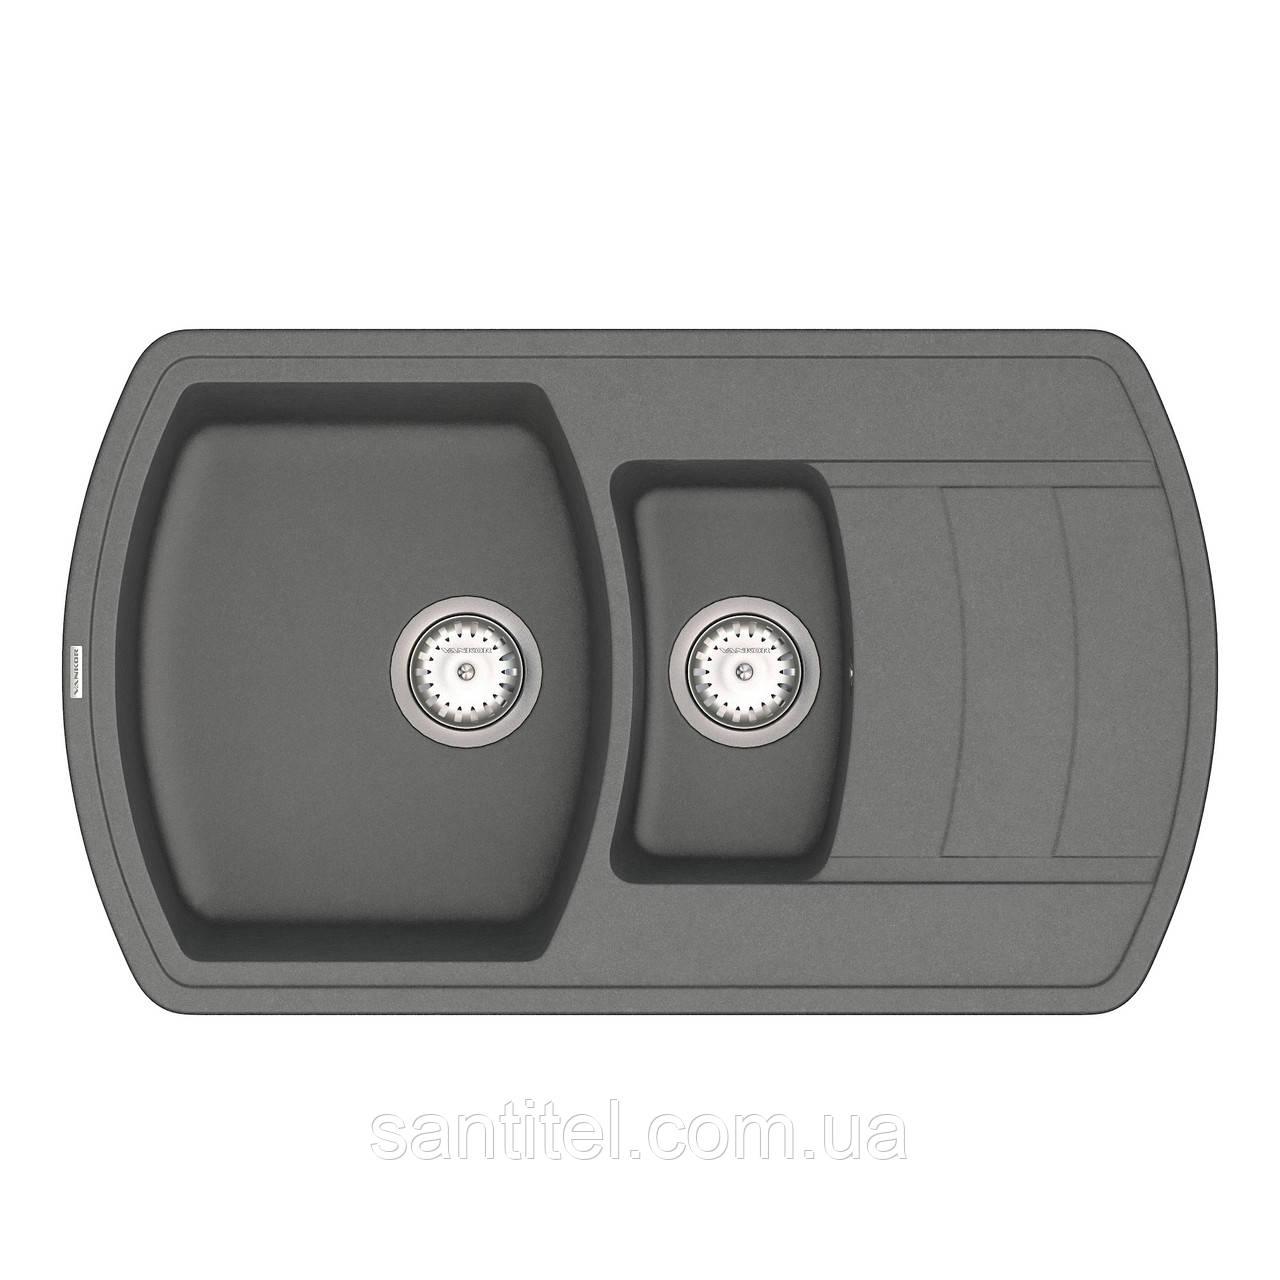 Кухонна мийка VANKOR Norton NMP 04.86 Gray + сифон VANKOR